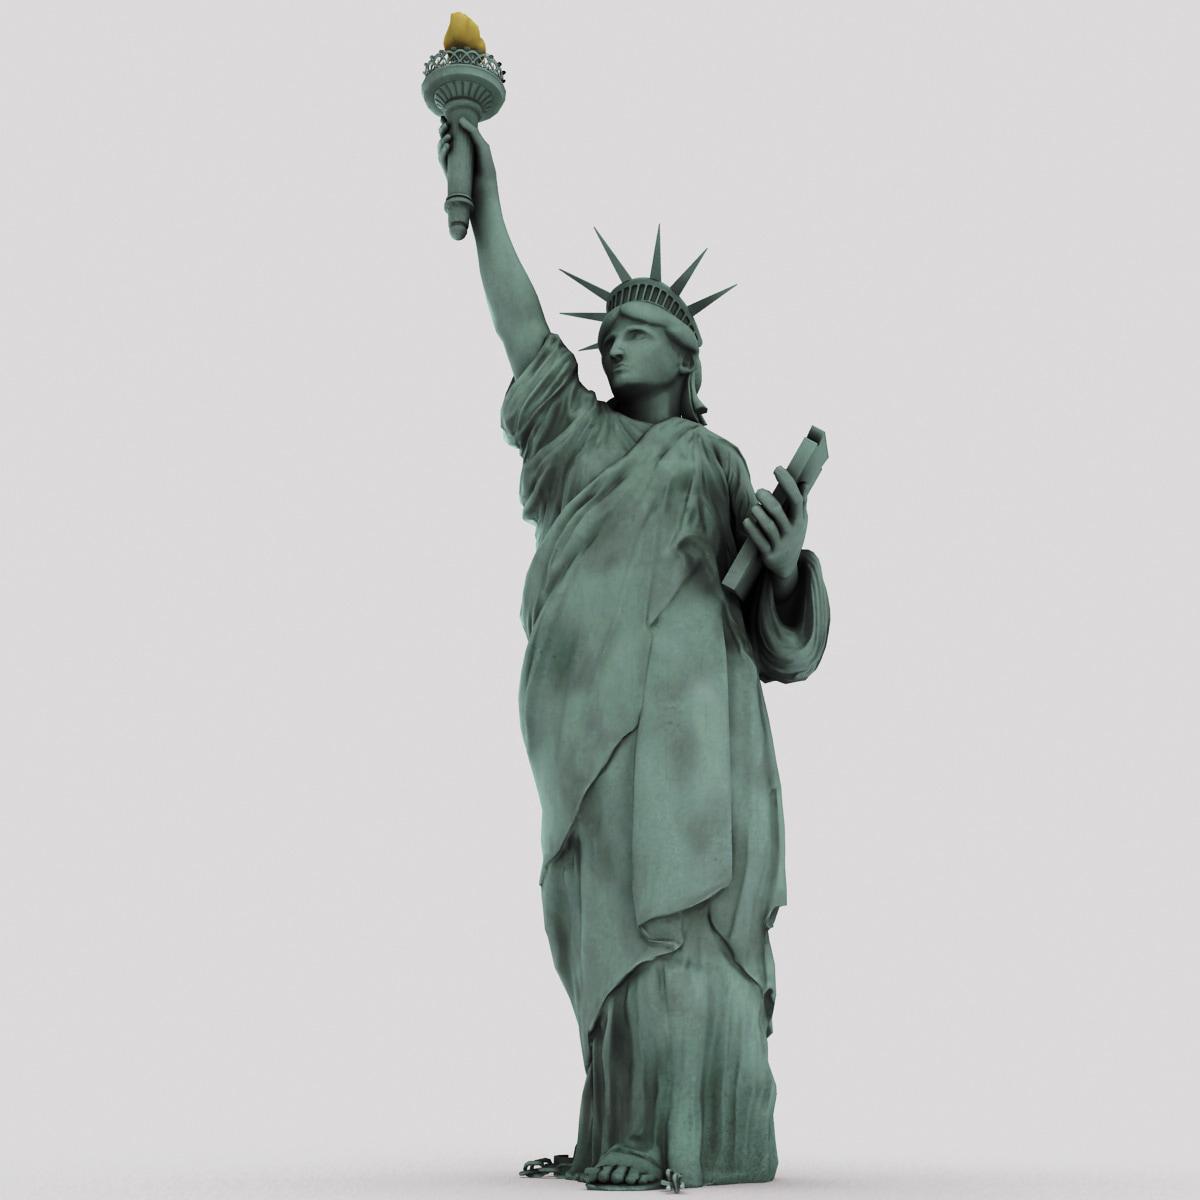 Statue_of_Liberty_v2_001.jpg